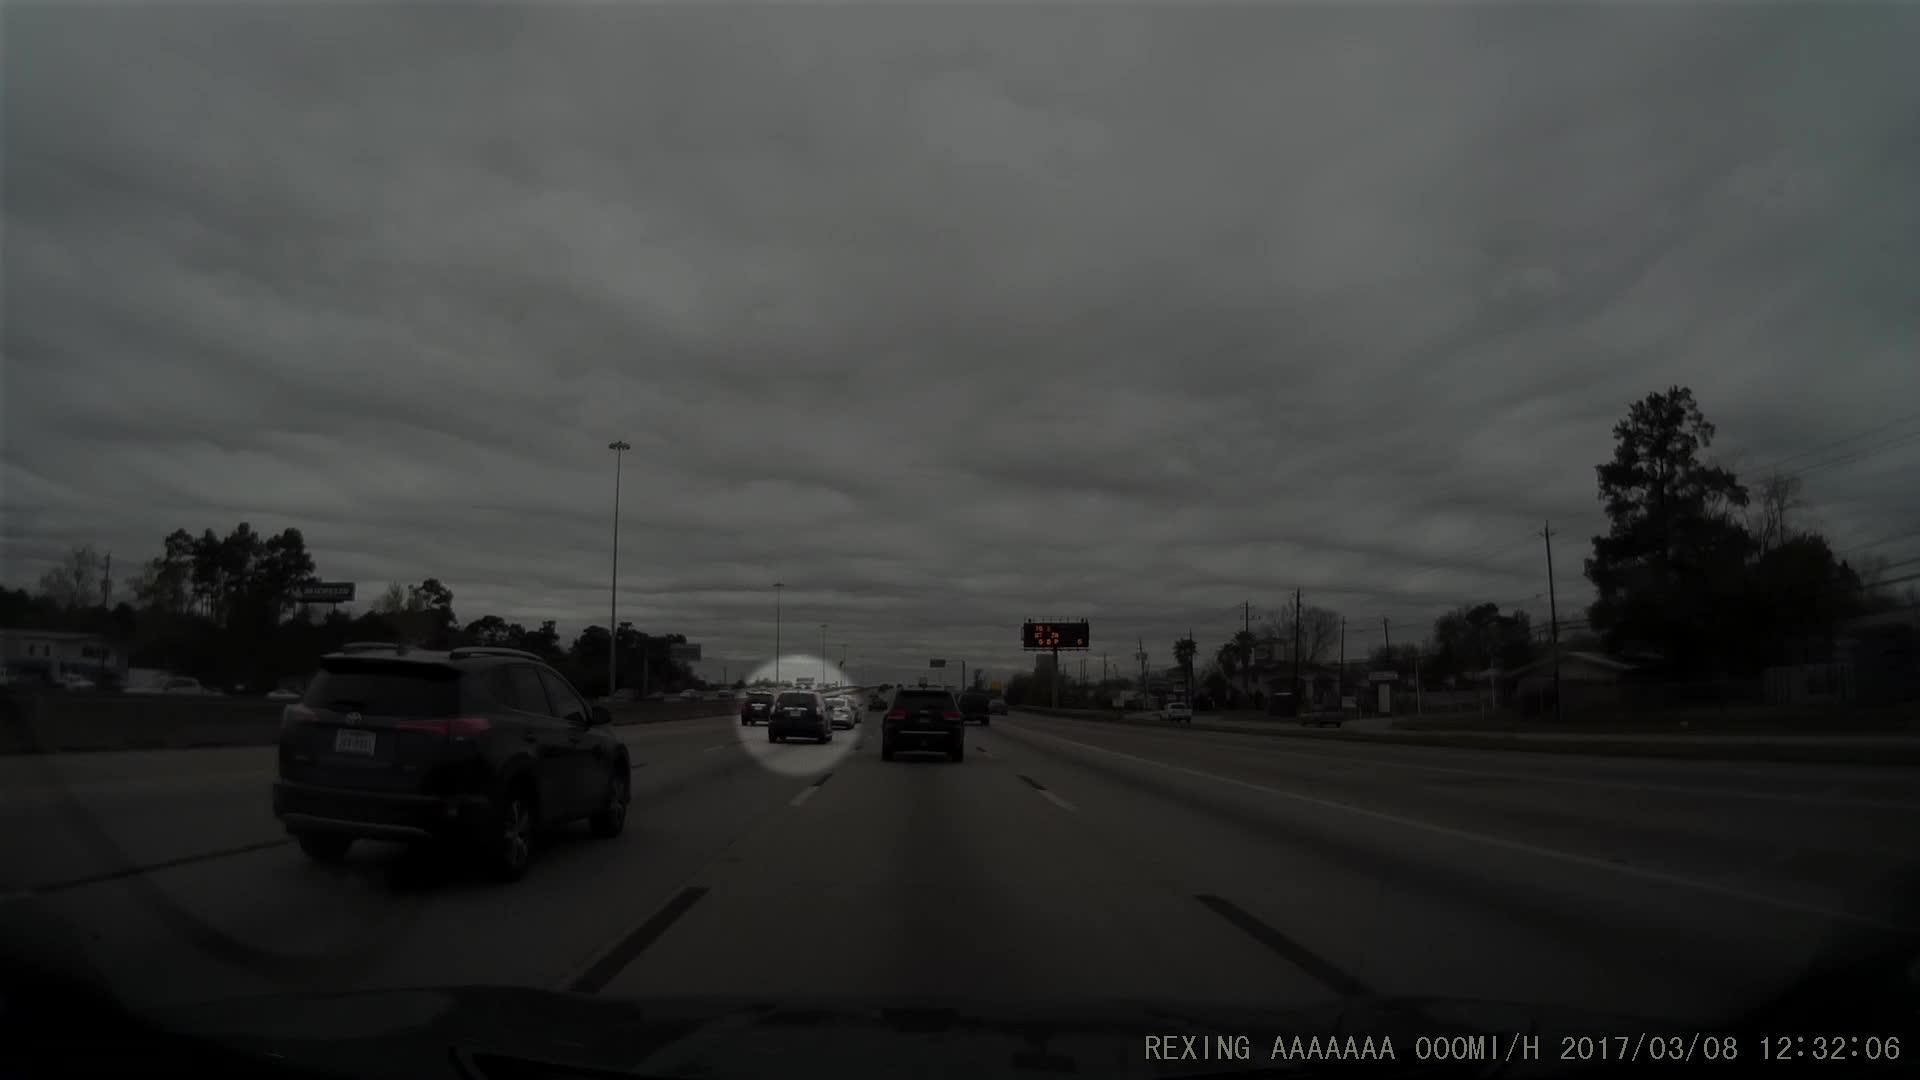 Roadcam, Honda CRV Unsafe Lane Change GIFs